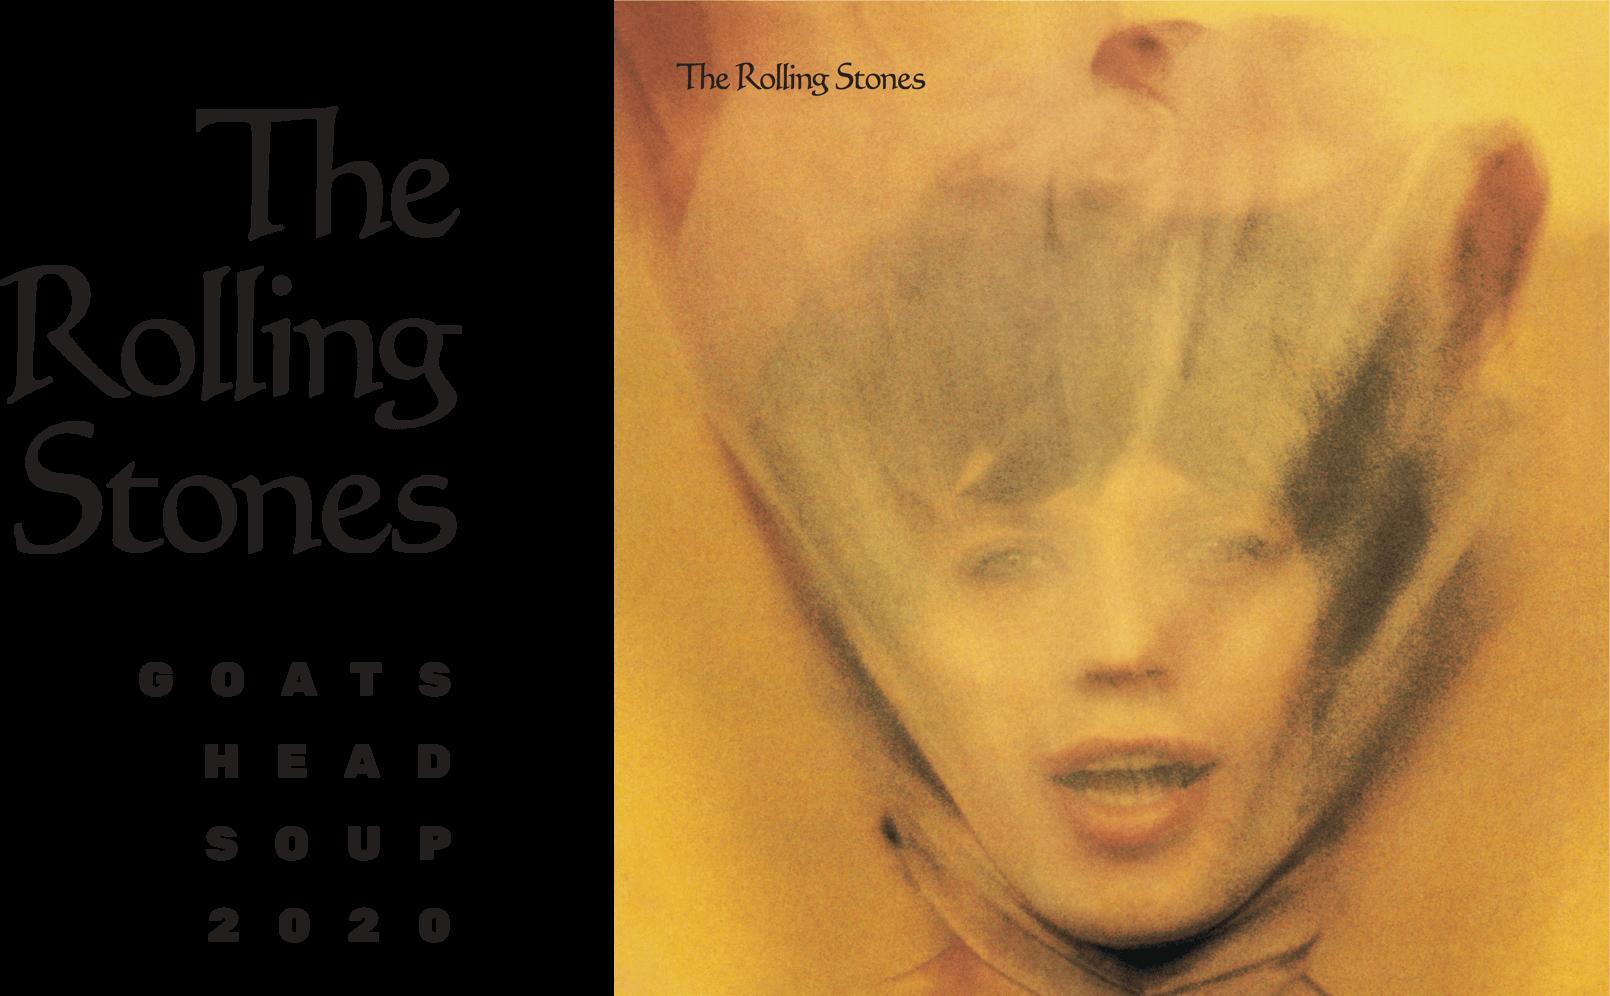 The Rolling Stones. - Página 17 Ghs-header-desktop@2x